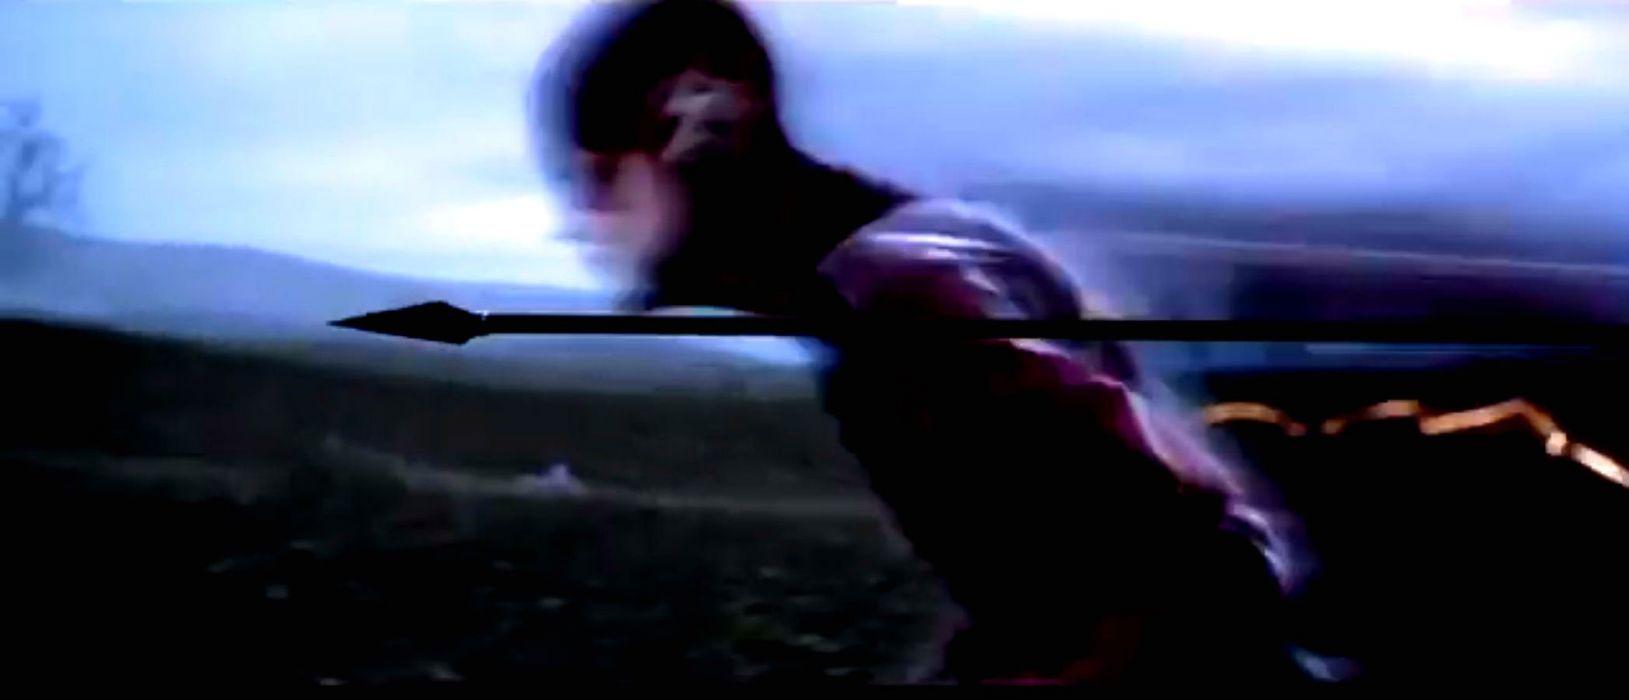 THE FLASH superhero drama action series mystery sci-fi dc-comics comic d-c wallpaper